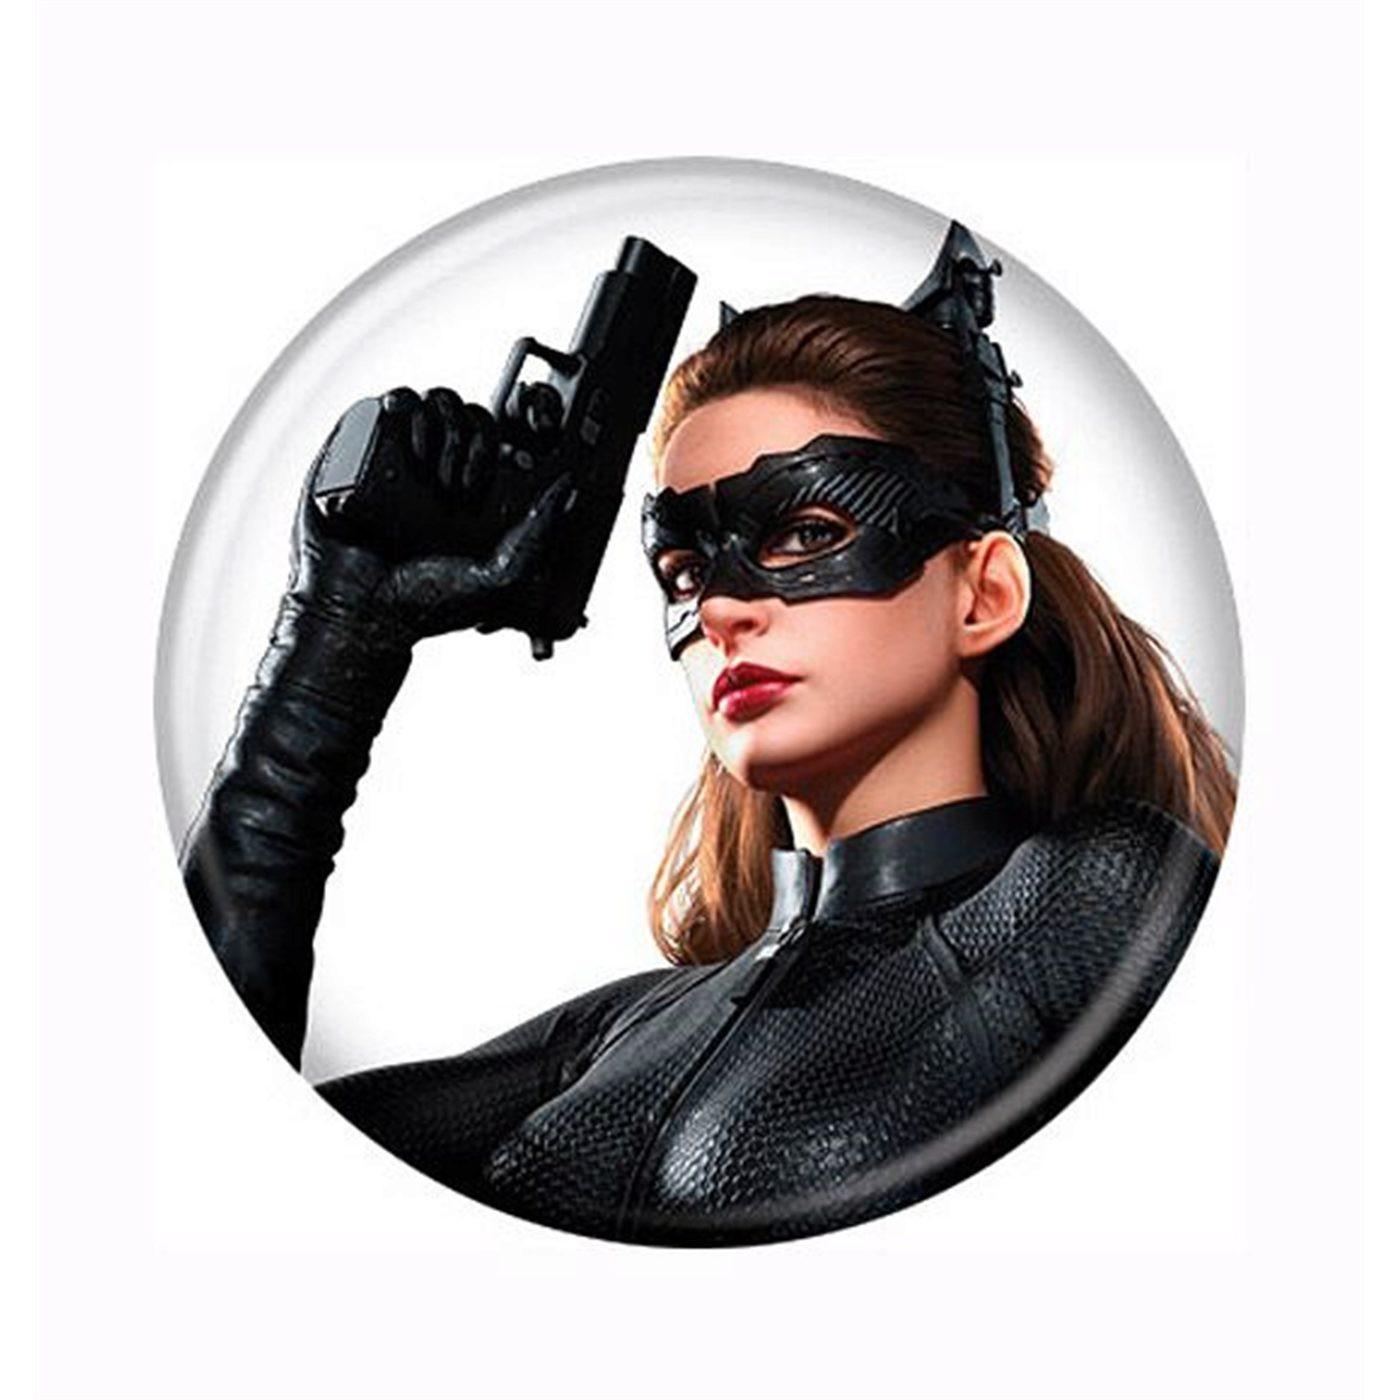 Dark Knight Rises Catwoman Gun Up Button